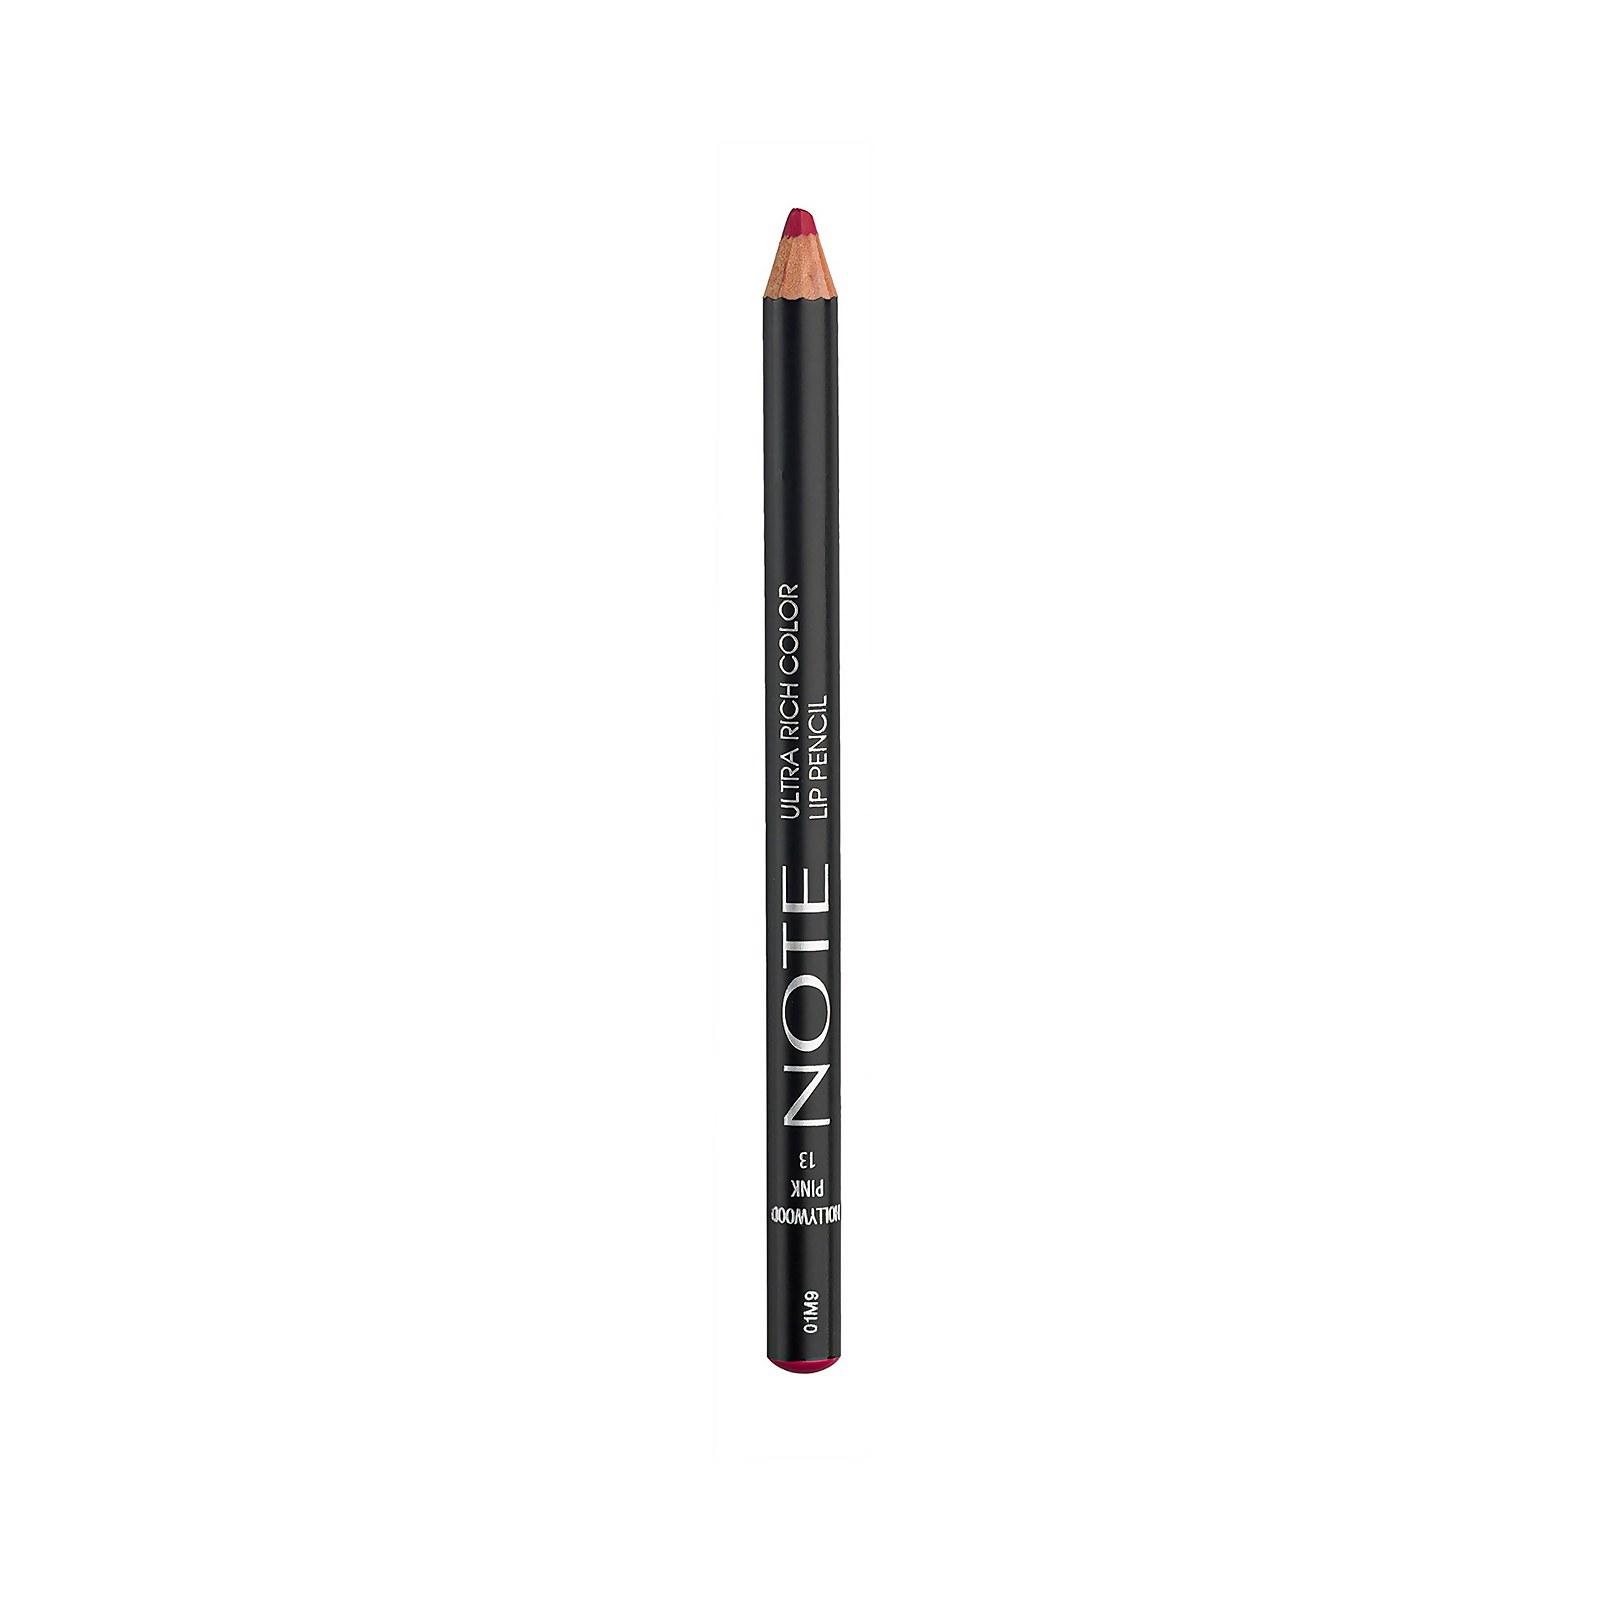 Купить Note Cosmetics Ultra Rich Color Lip Pencil 1.1g (Various Shades) - 13 Hollywood Pink